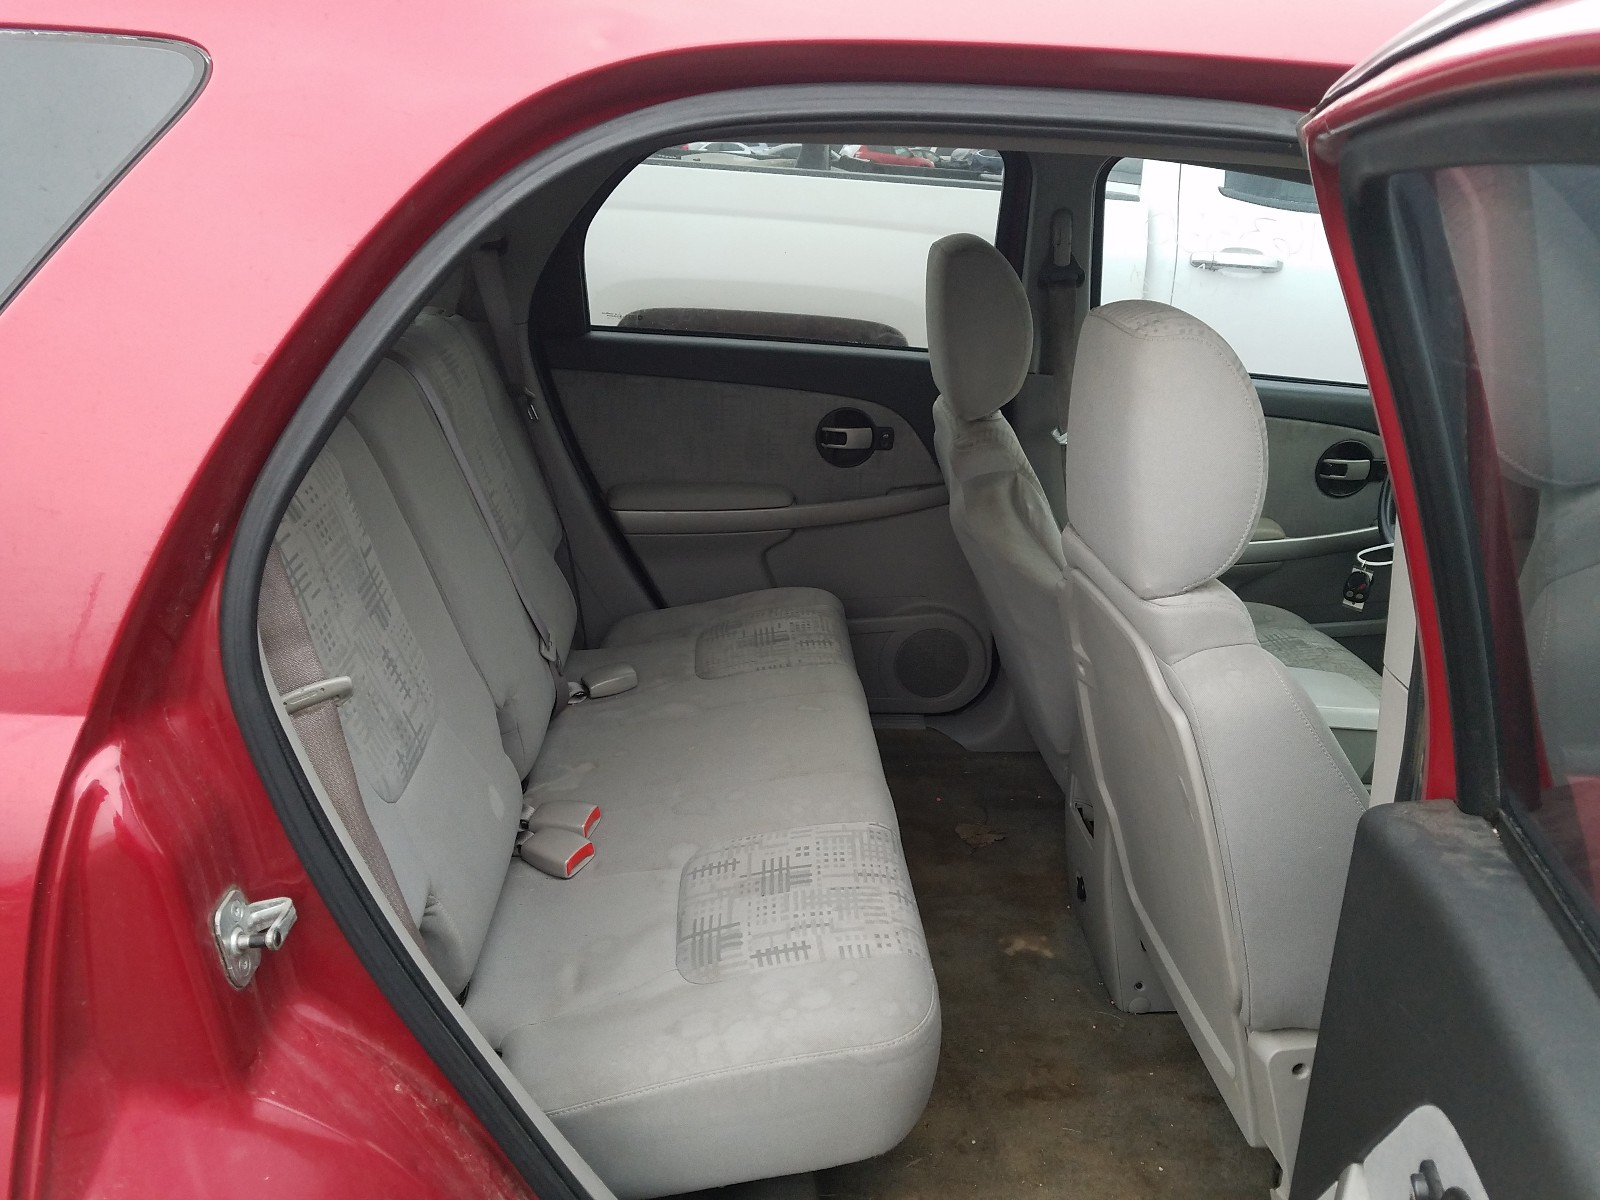 2CNDL13F466179511 - 2006 Chevrolet Equinox Ls 3.4L detail view